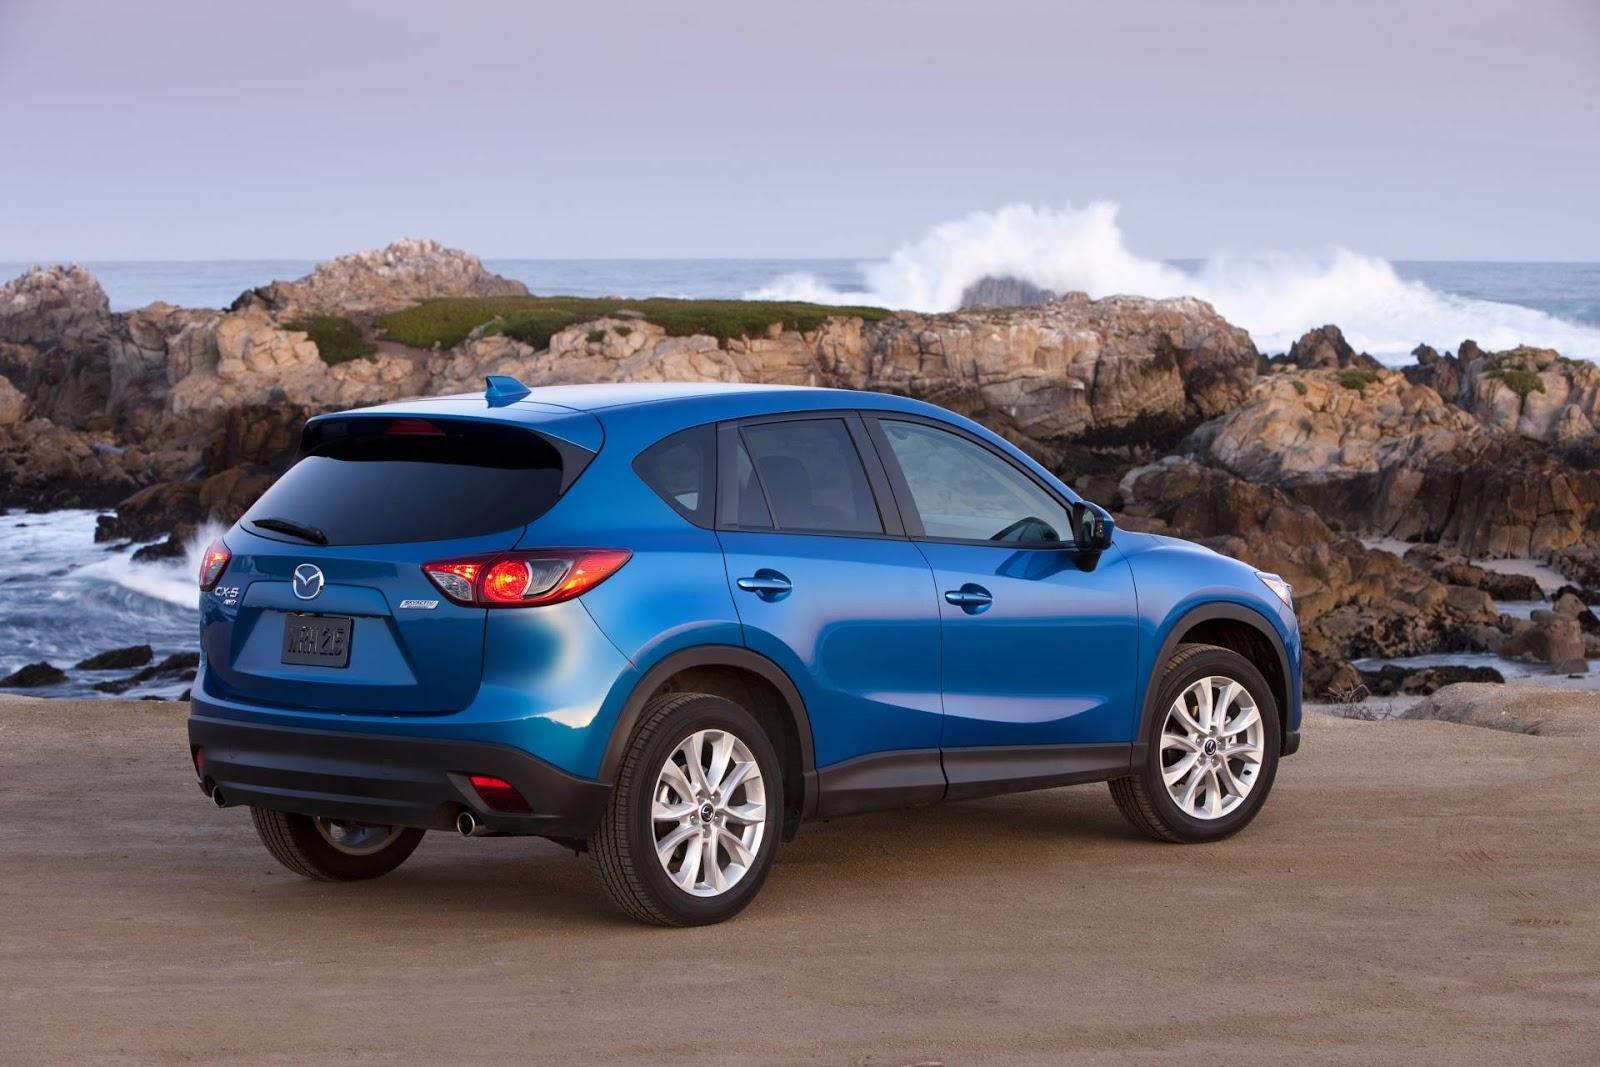 Mazda Cx 5 2013 Hottest Car Wallpapers Bestgarage